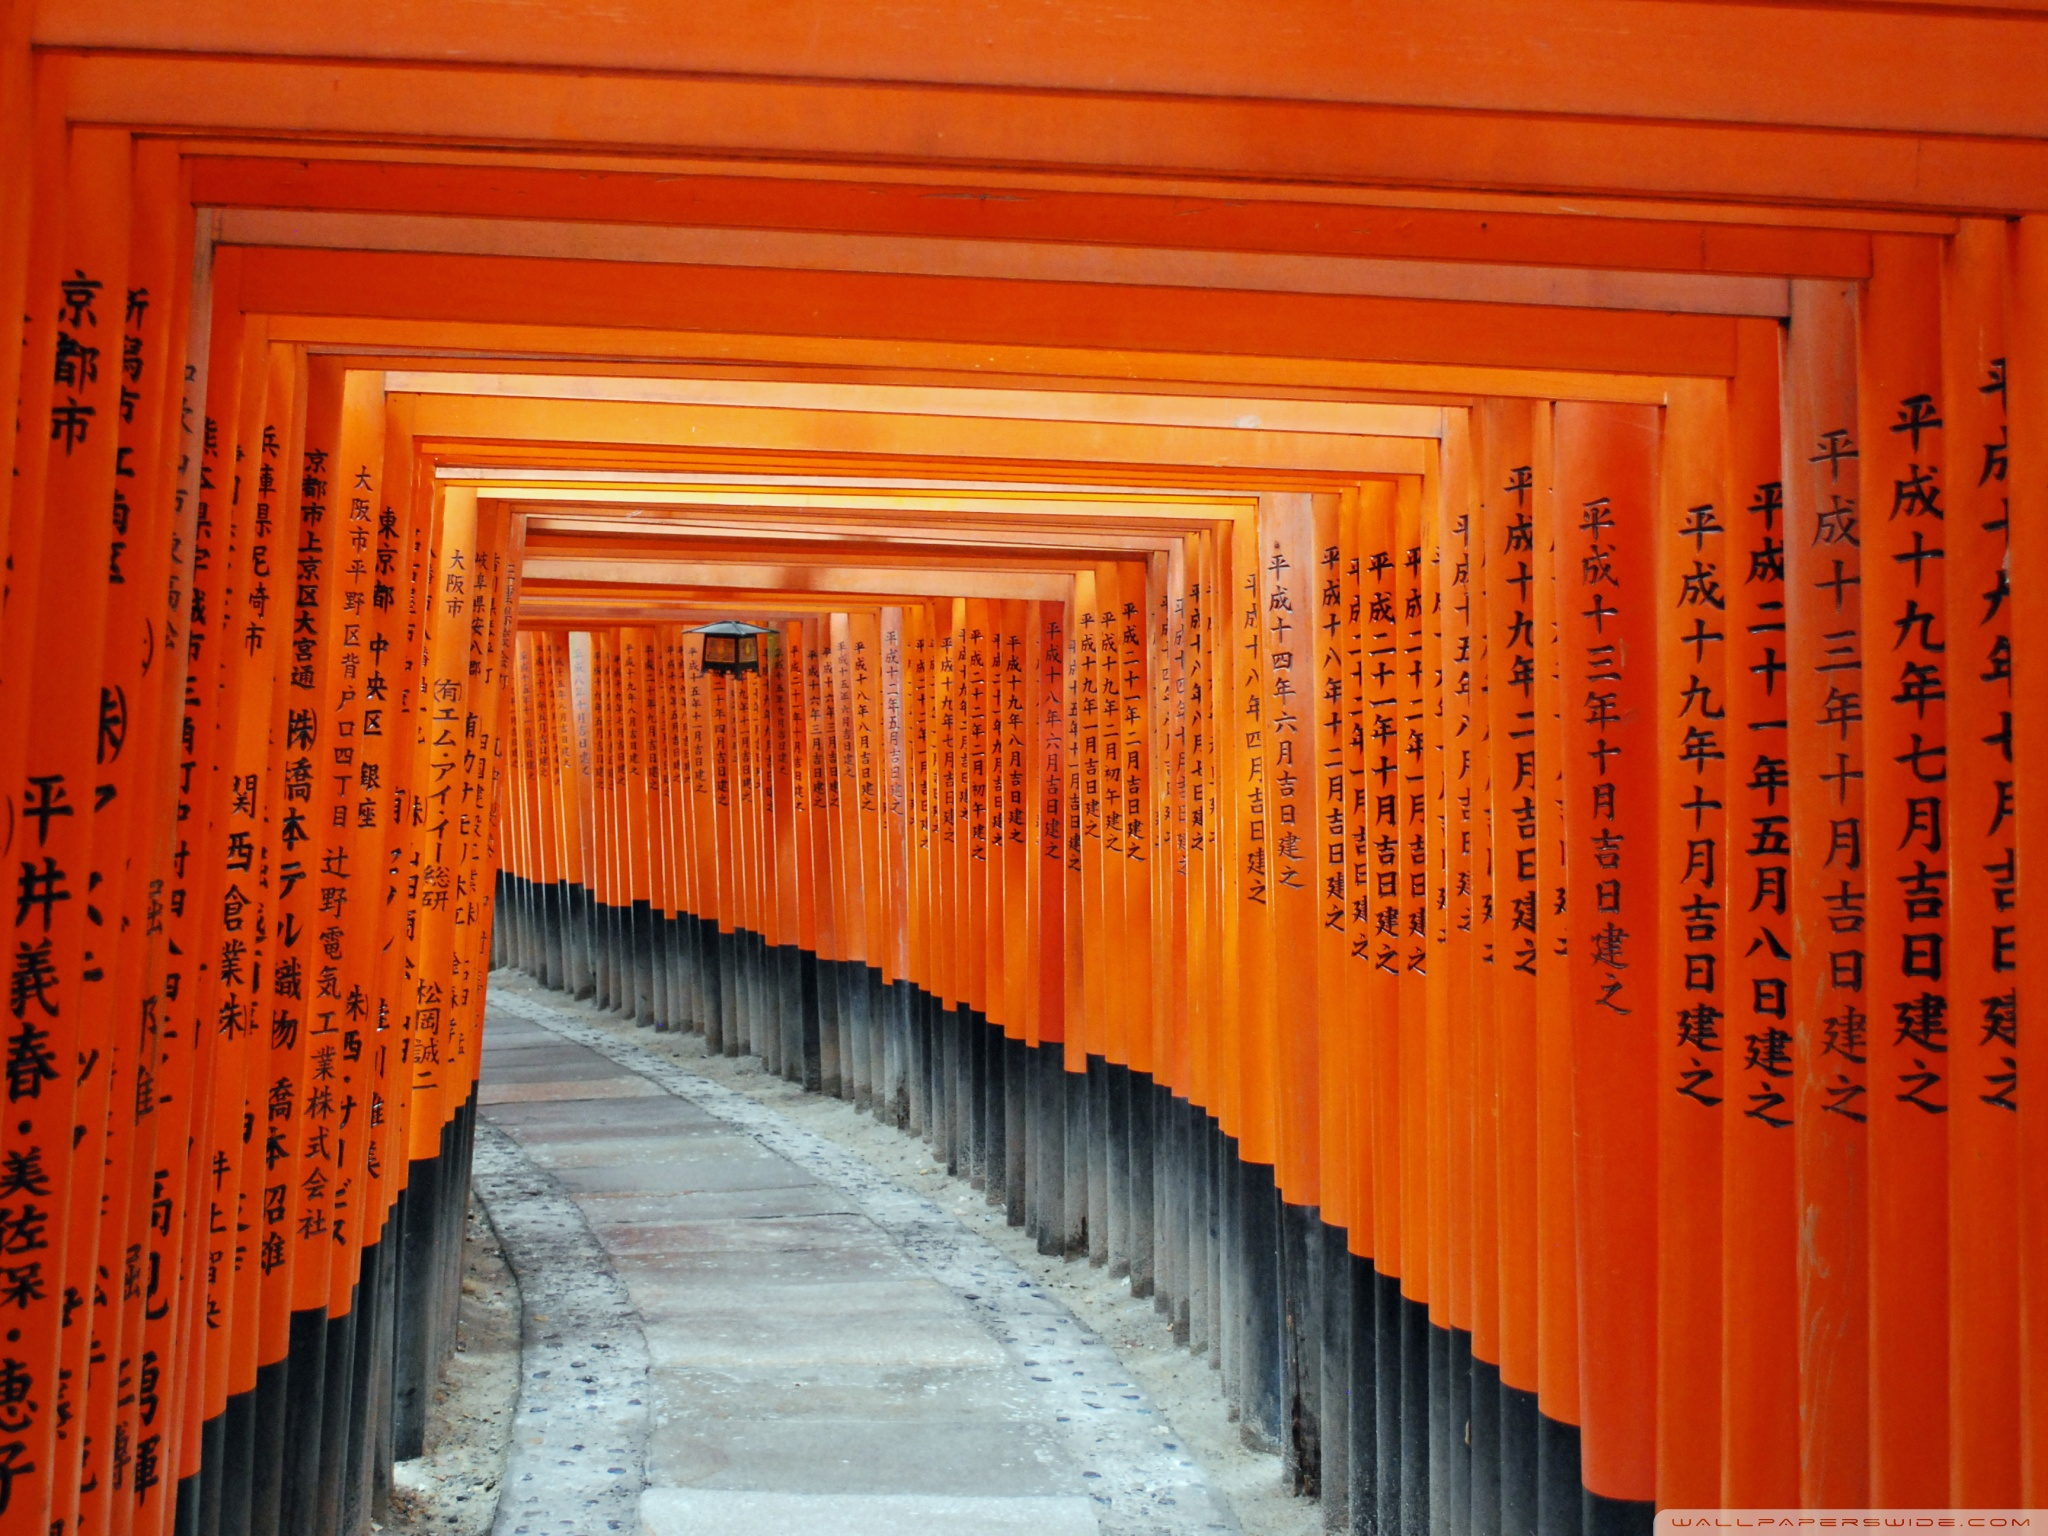 Fushimi Inari Taisha Kyoto Japan 4K HD Desktop Wallpaper for 2048x1536